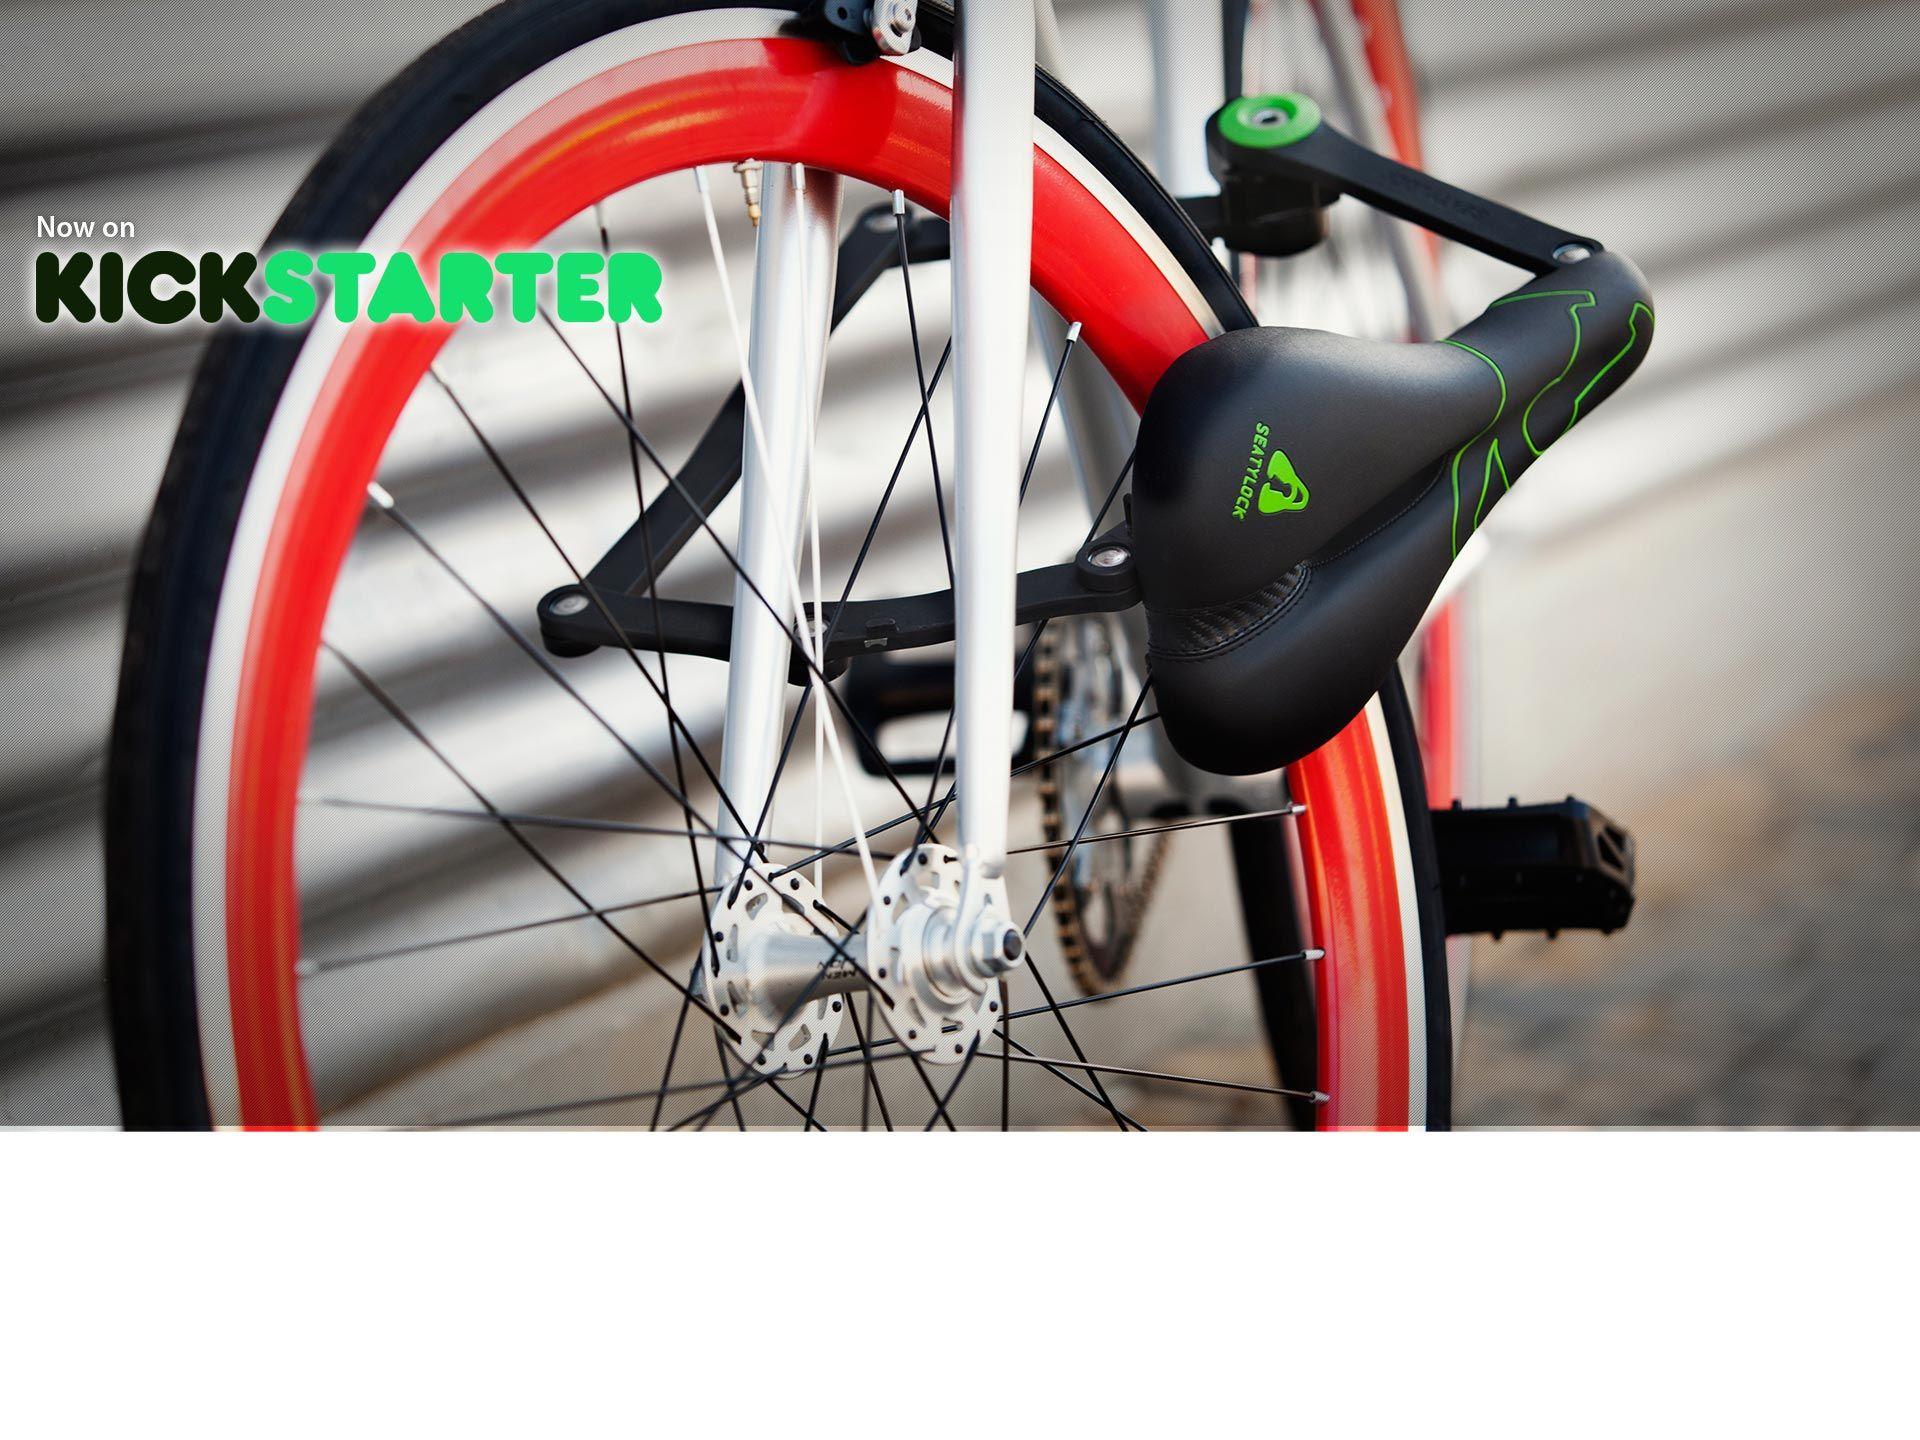 Pin By Sense And Grace On He Bike Lock Bike Seat Bicycle